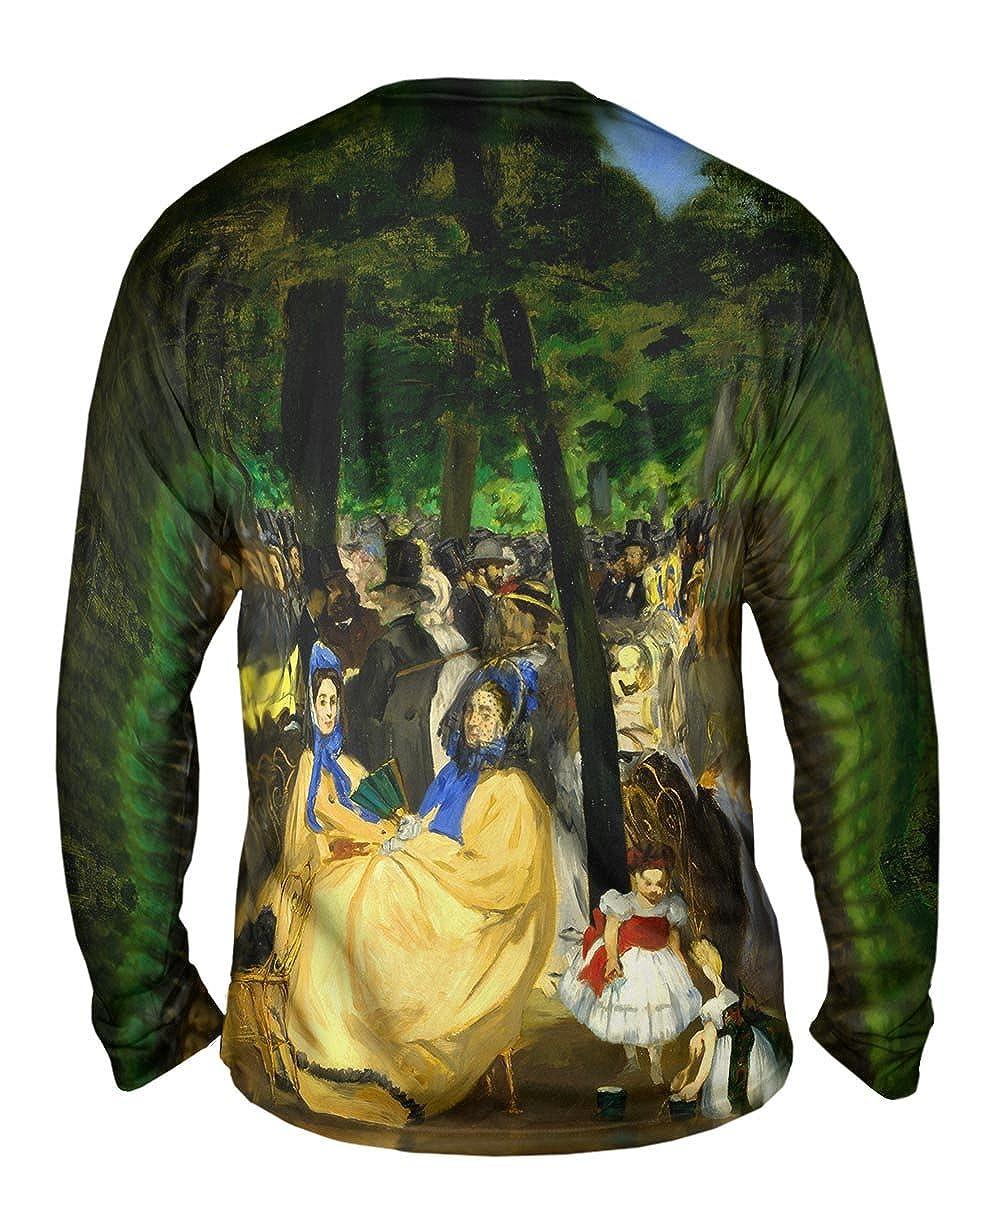 Musica en las Tuller Yizzam Edouard Manet Mens Long Sleeve 1667